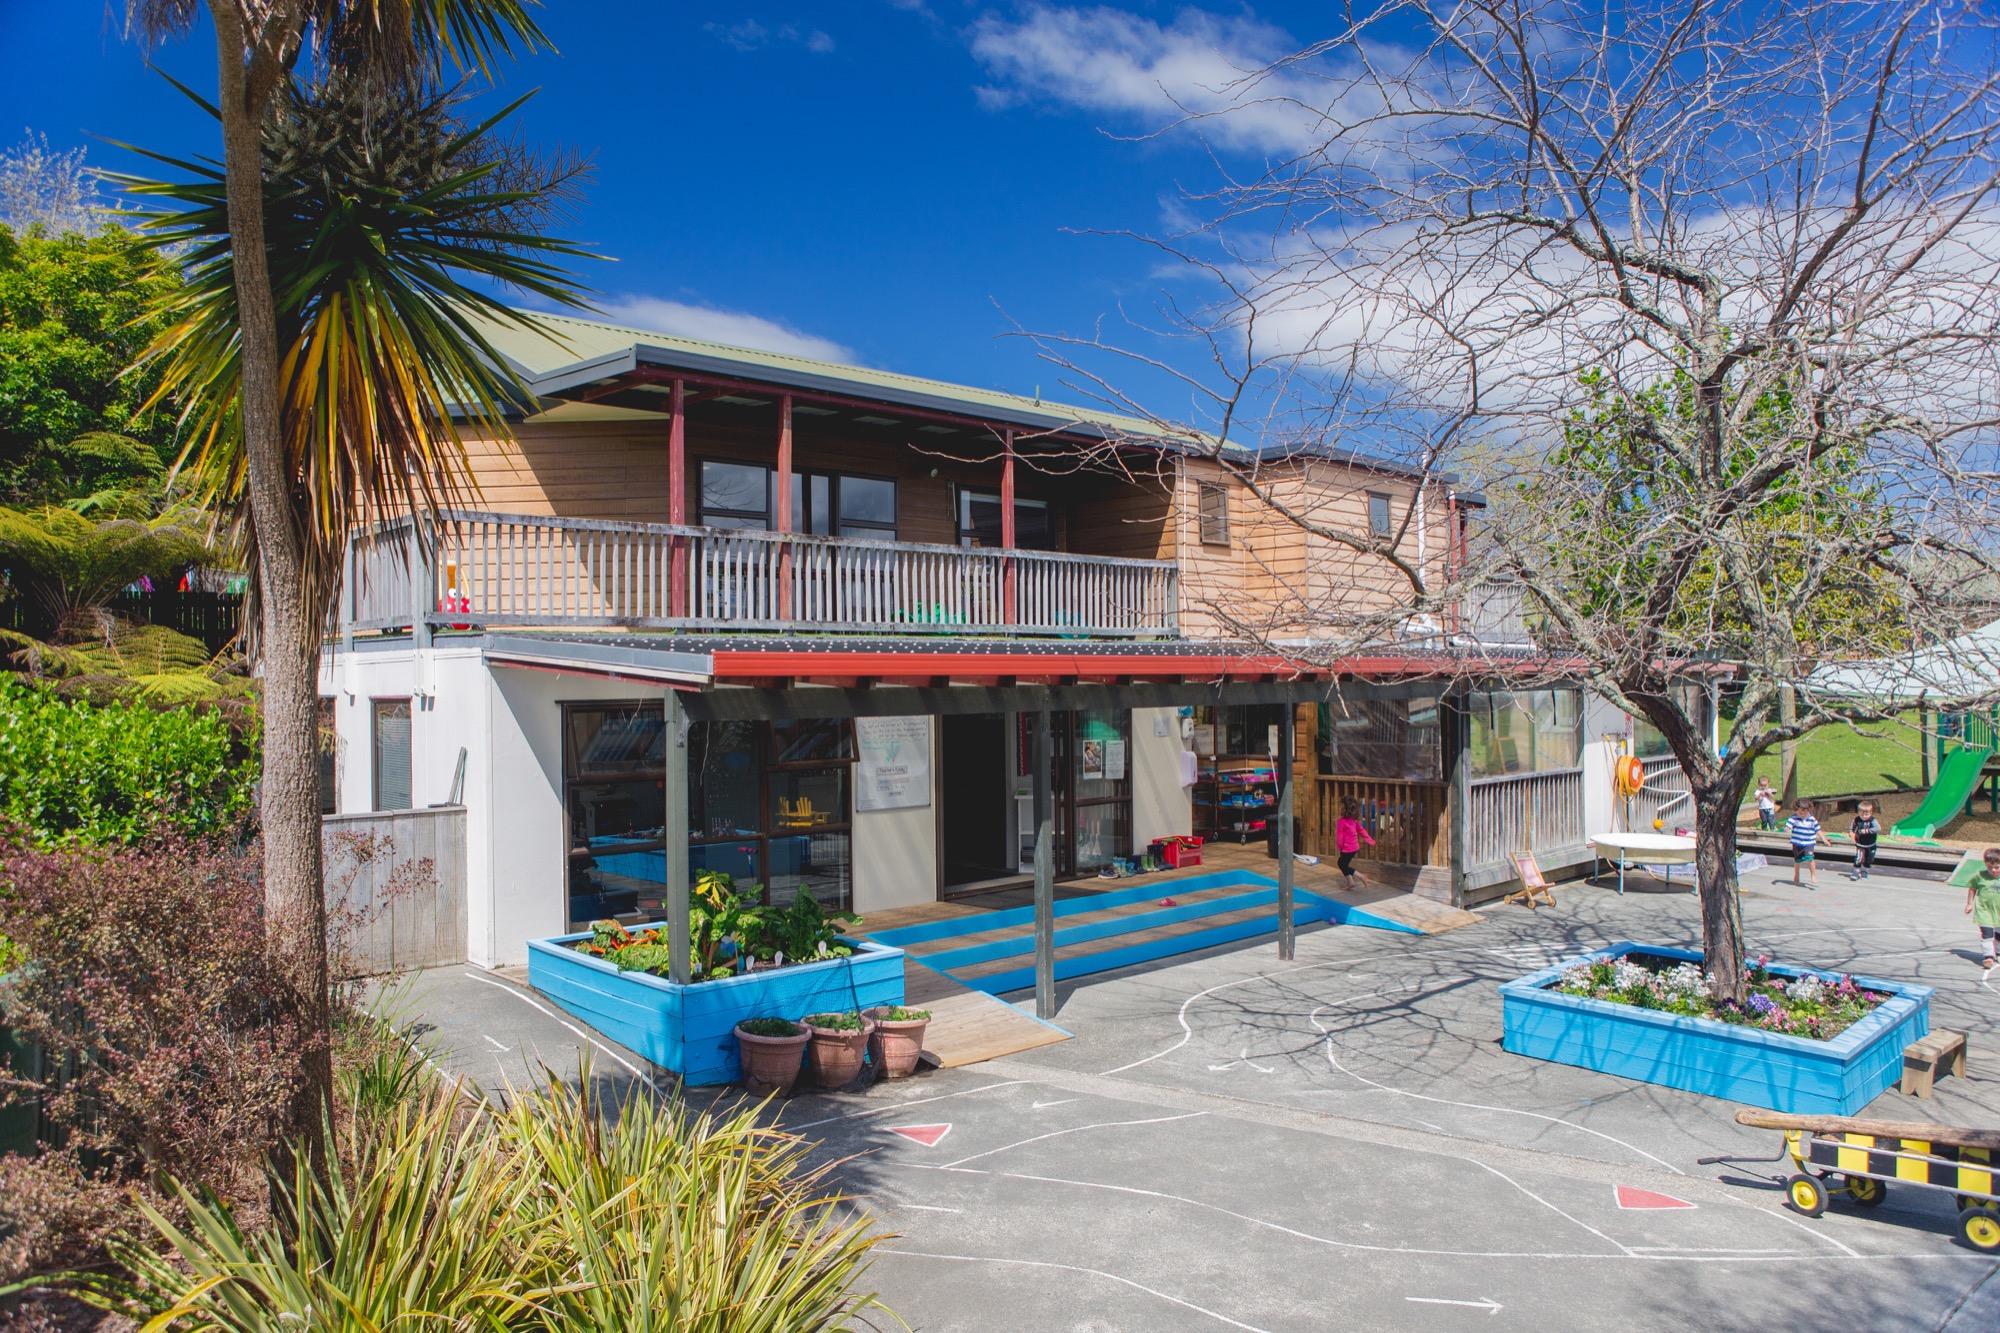 KingsWay-Preschools-New-Zealand-Snells-Beach-0159-Web.jpg